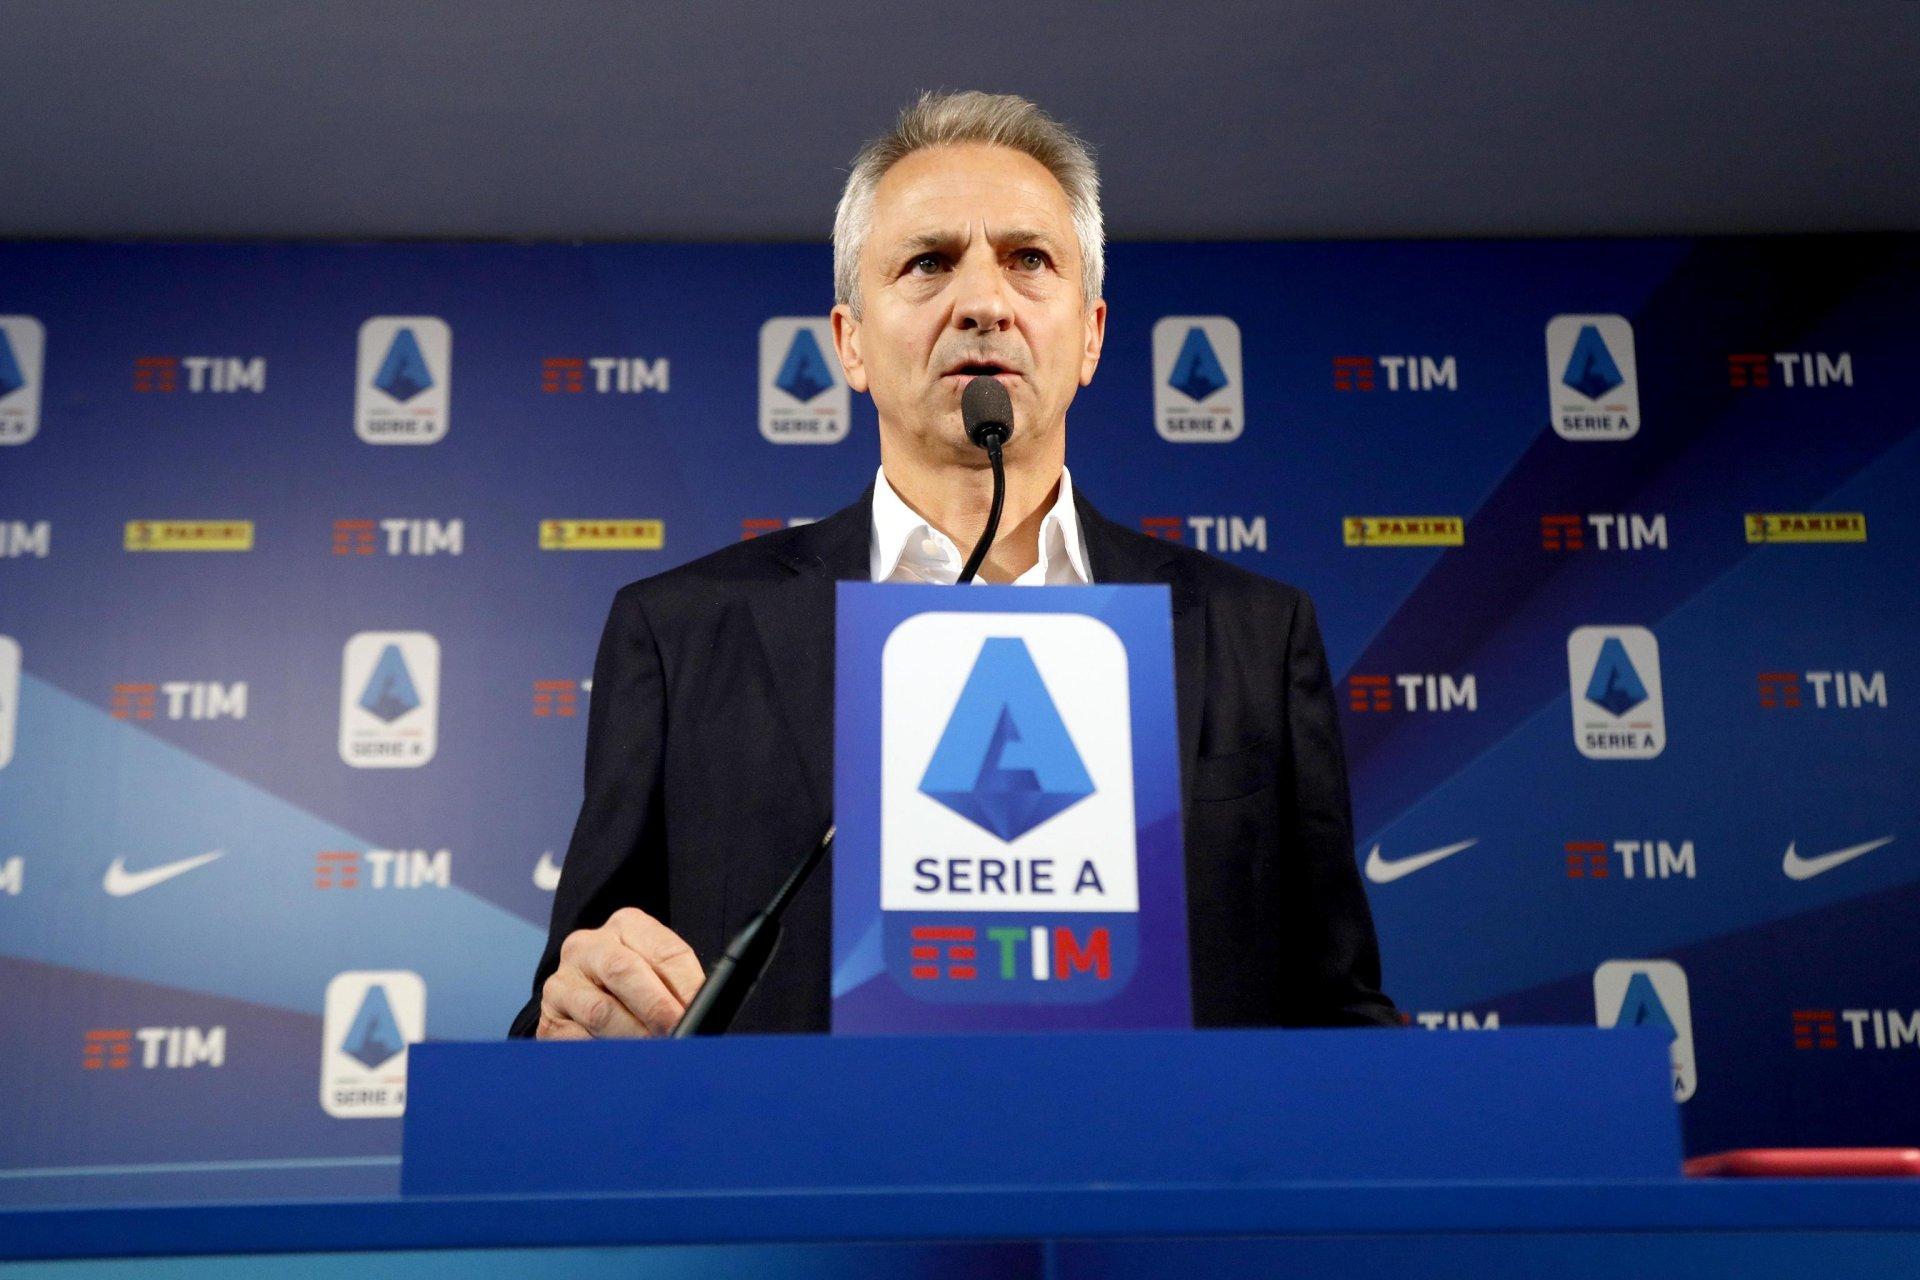 Serie A, Dal Pino: «Diritti tv in 6 mesi. Dialogo con Sky, Dazn, Mediapro e OTT»